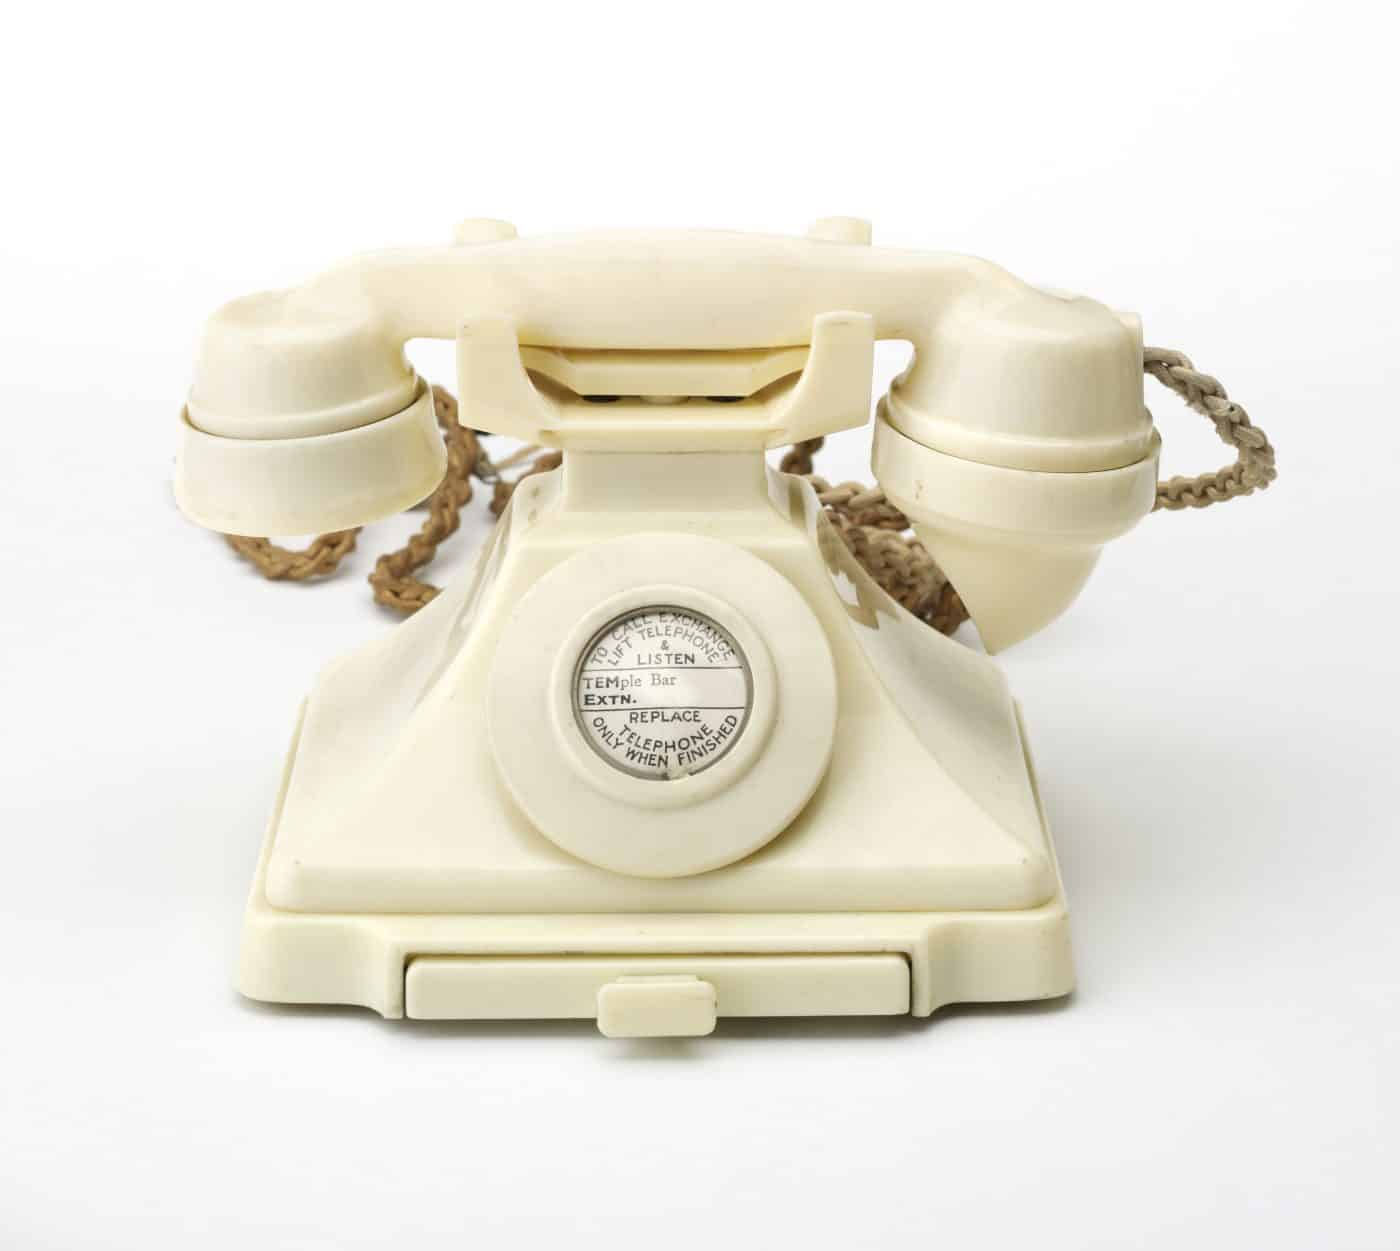 A 1934 telephone